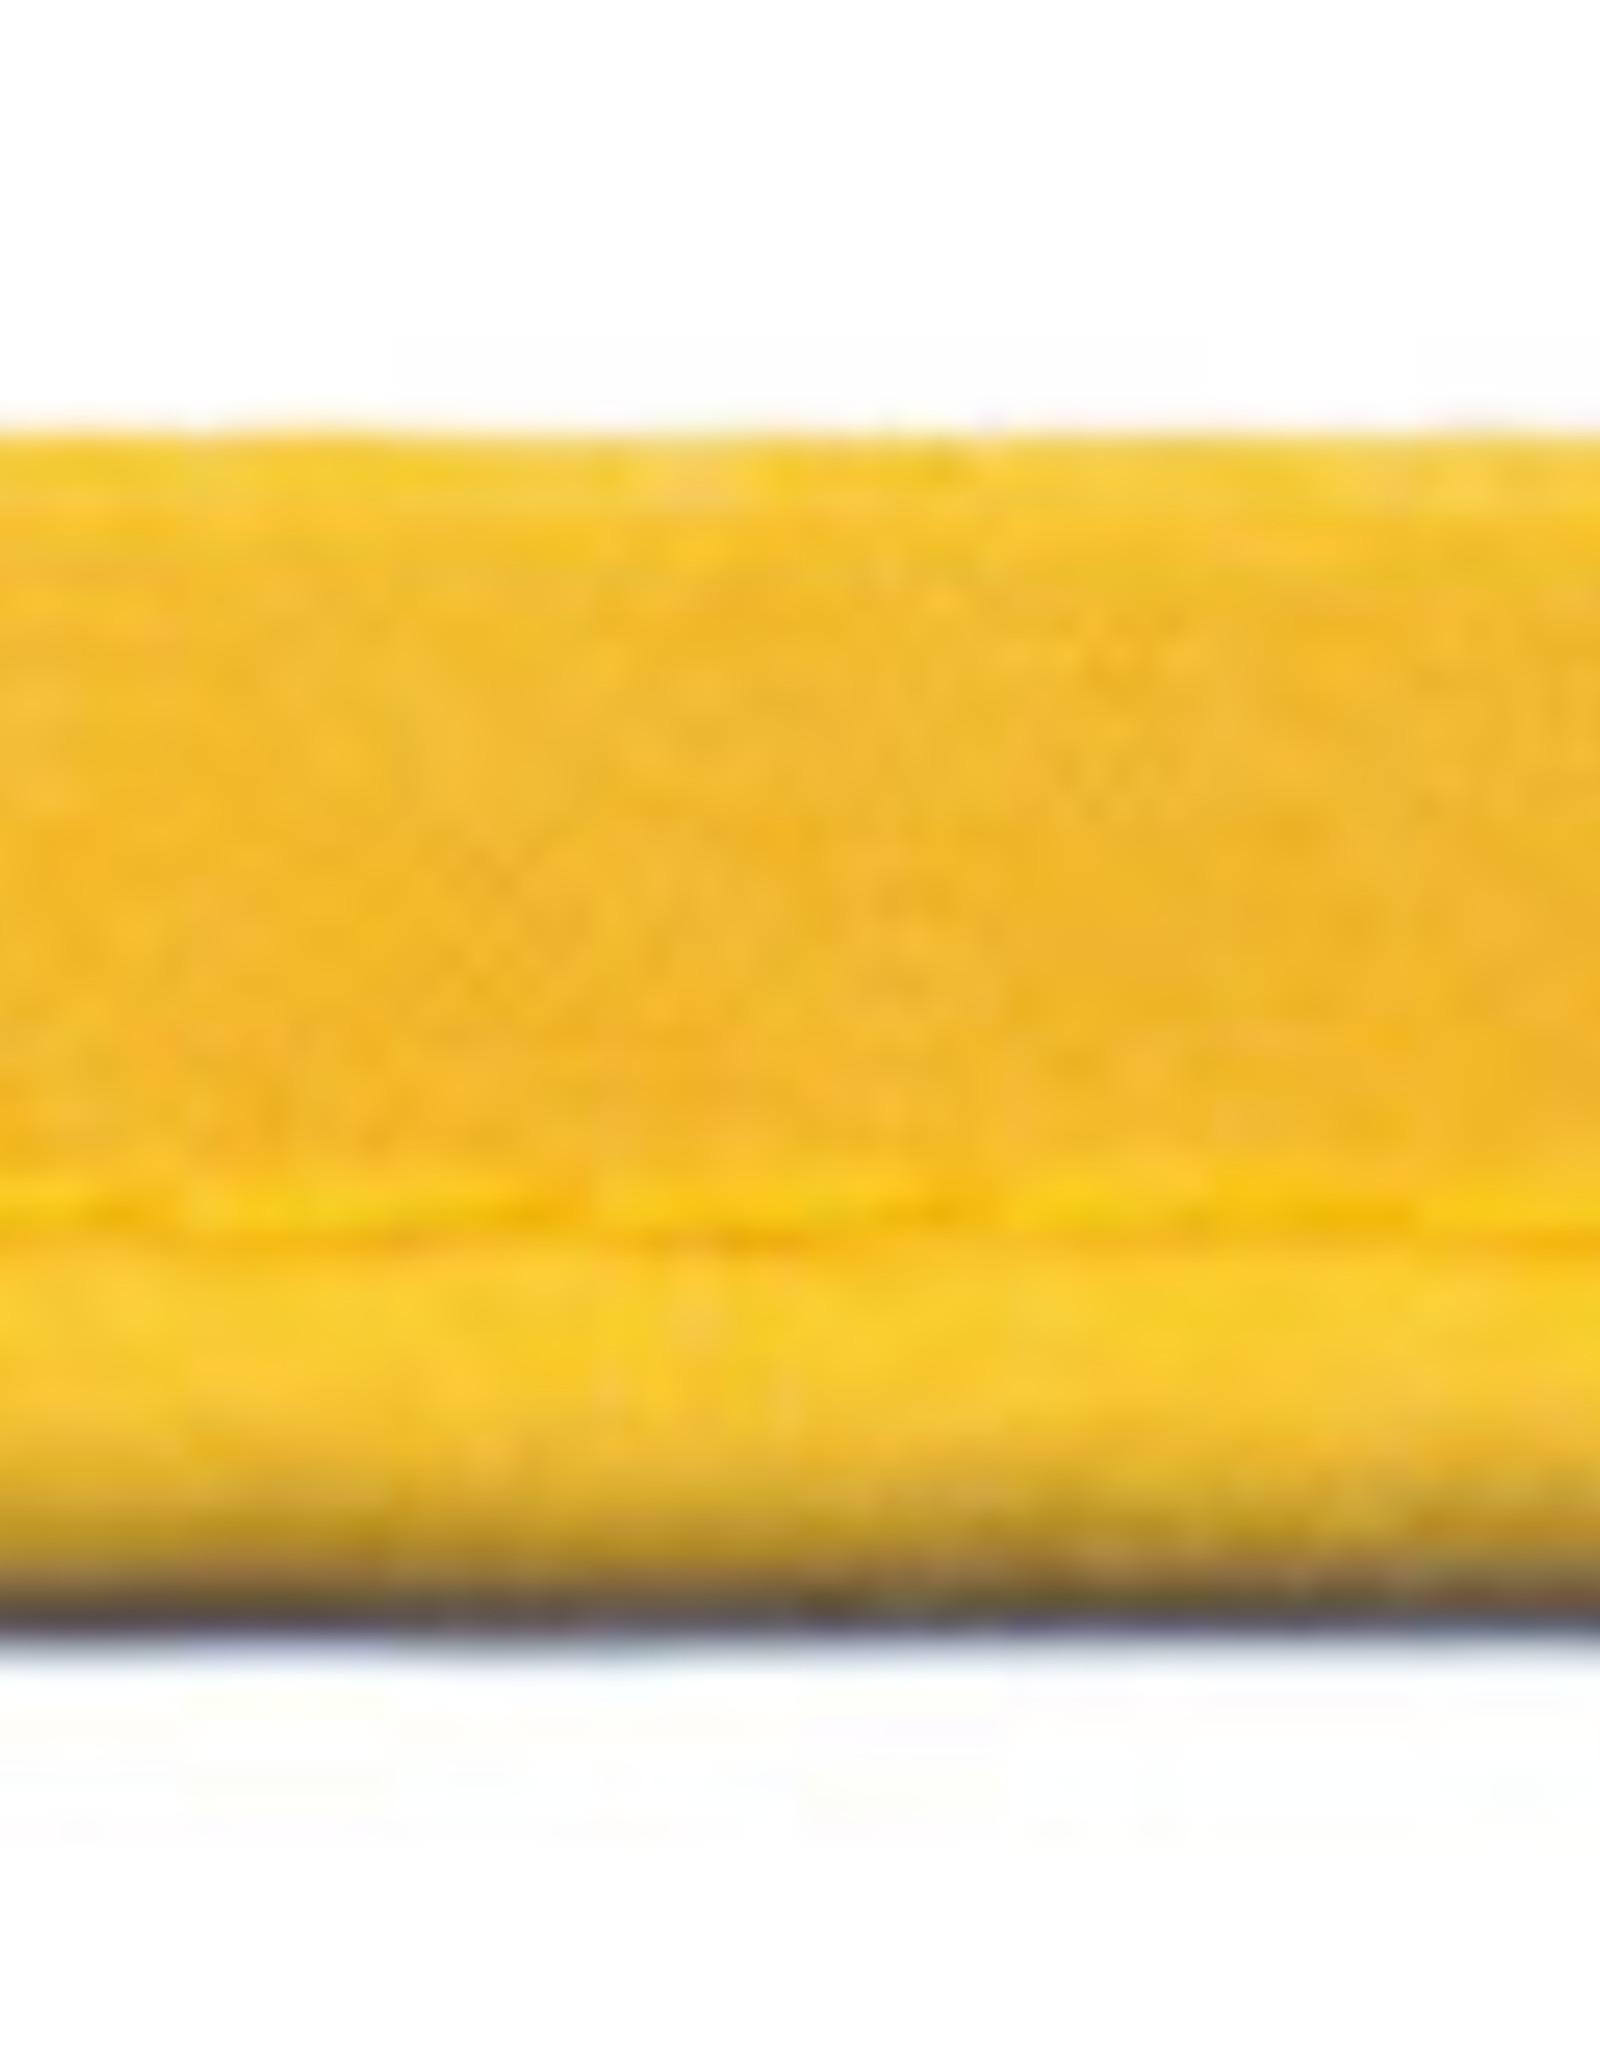 Paspelband oker geel